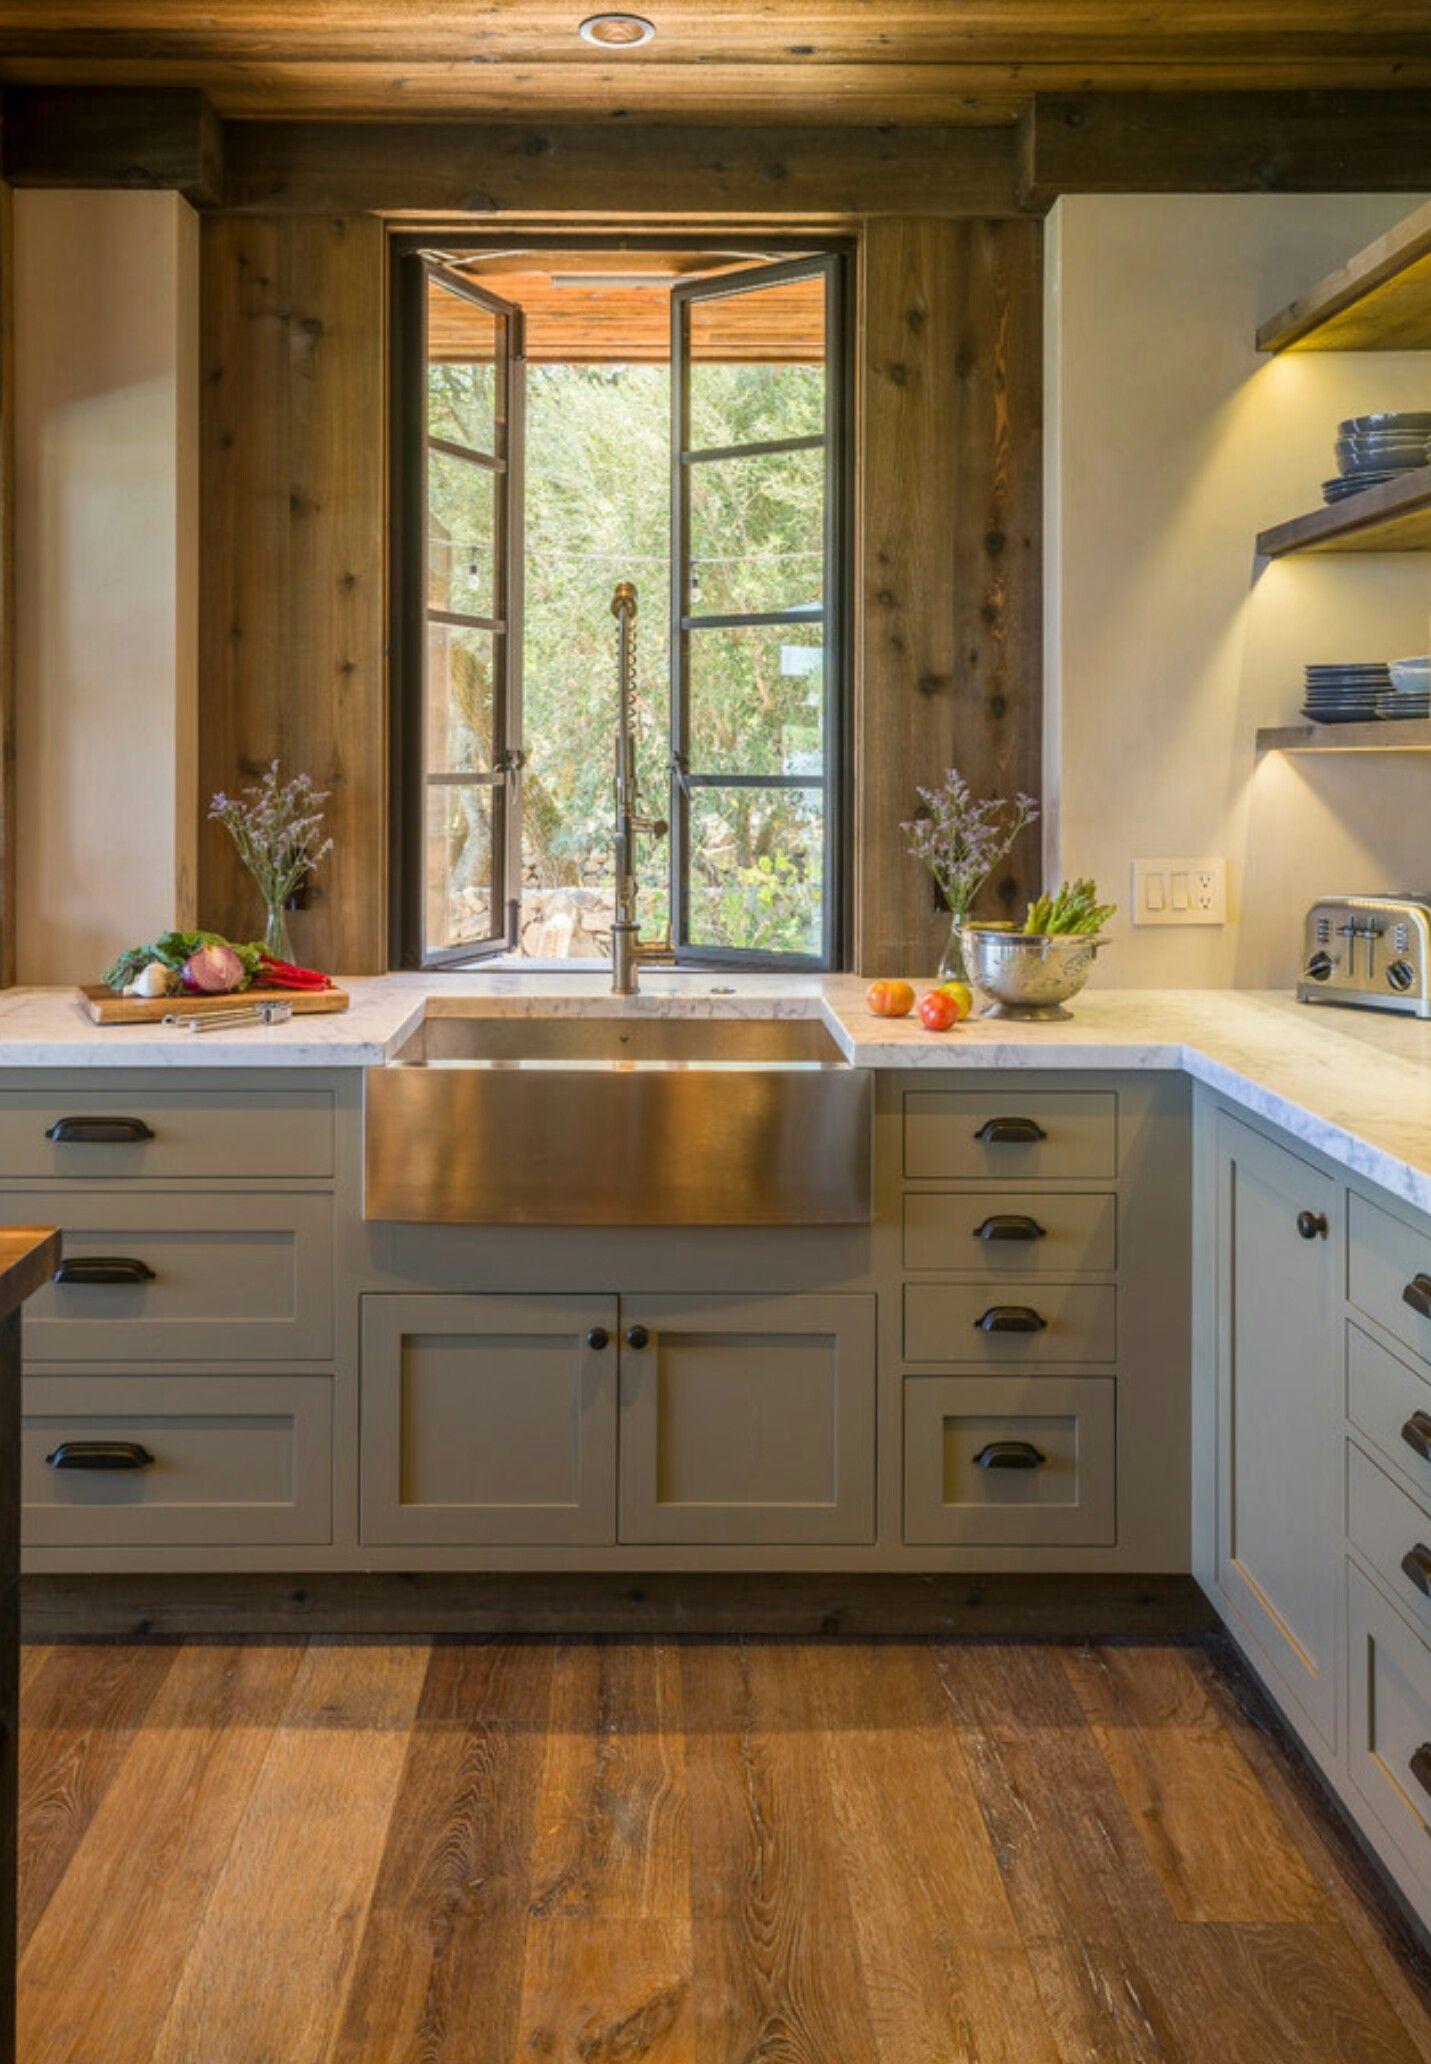 Pin by carina almeida on decoração o pinterest kitchens